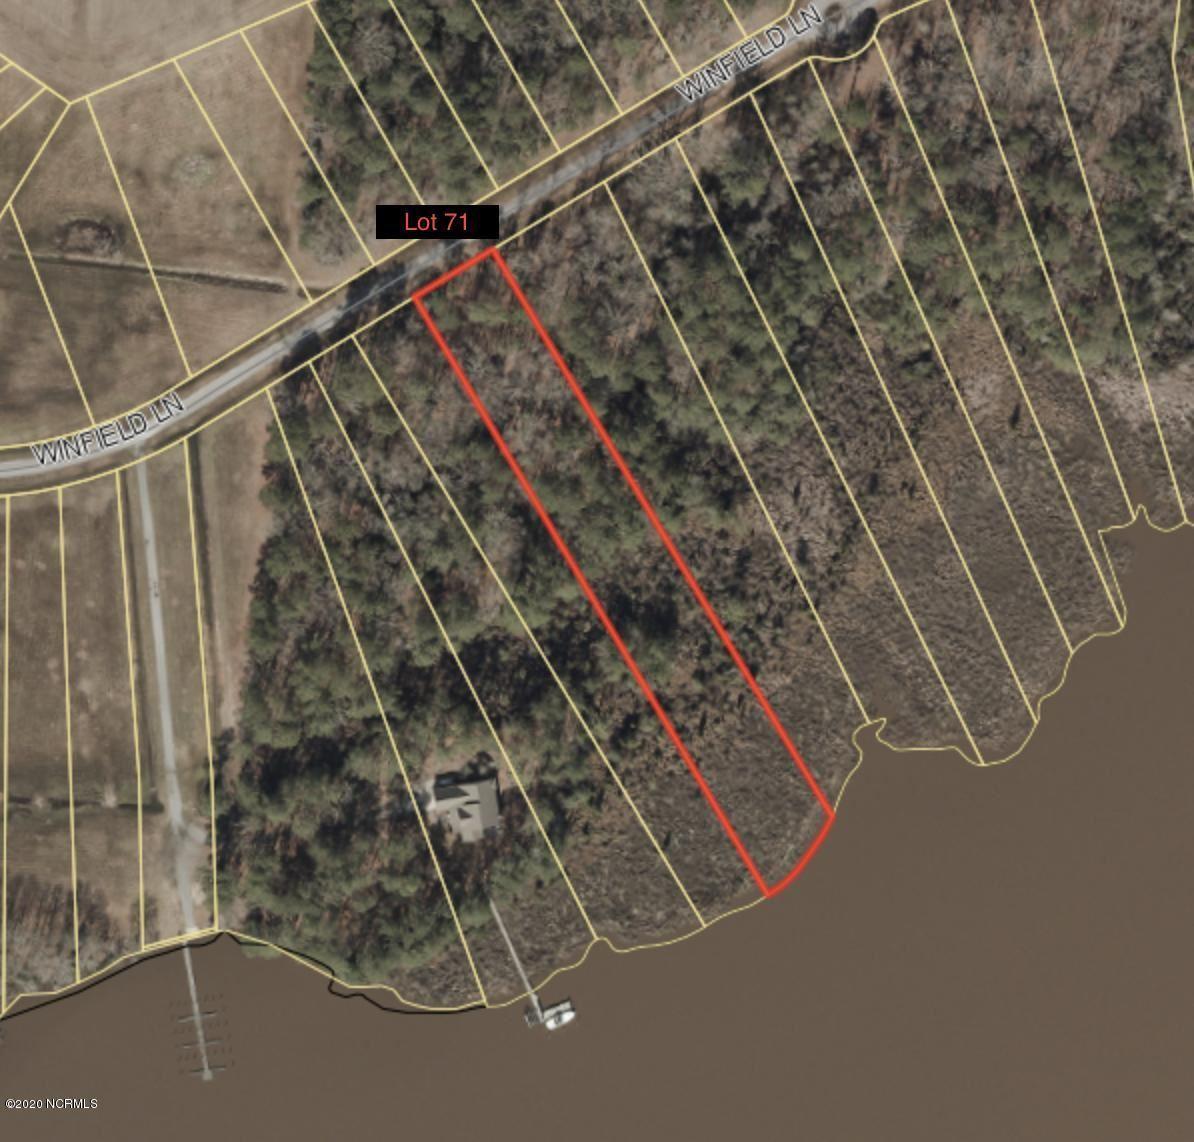 Photo of 71 Winfield Lane, Pinetown, NC 27865 (MLS # 100148092)